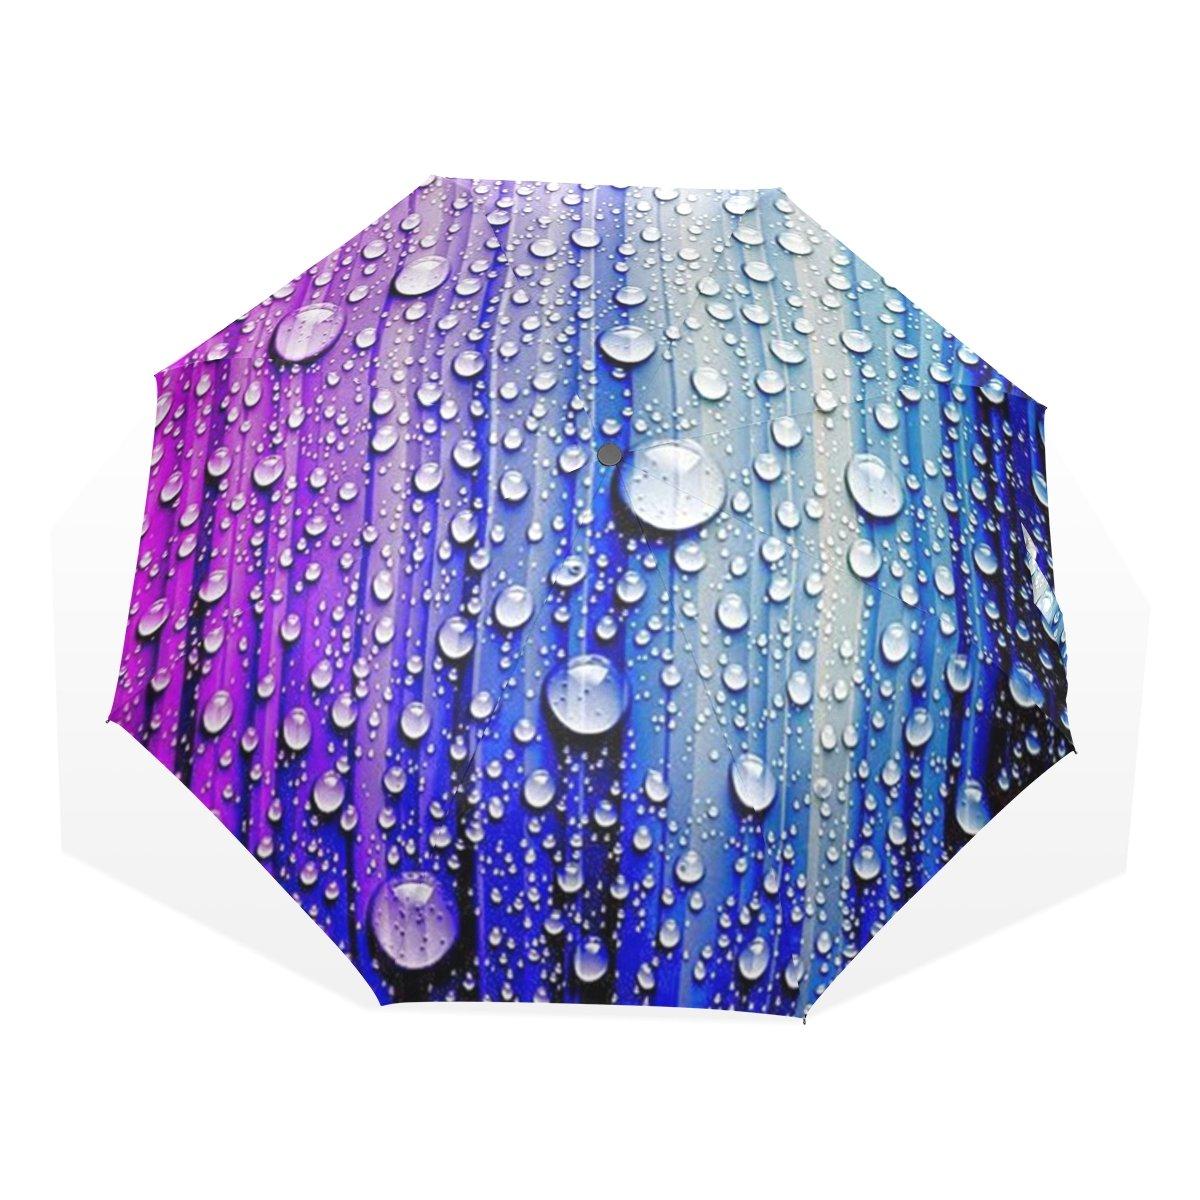 leisisi耐久性ポータブルコンパクト折りたたみ傘防風UV保護傘 B076ZV4S29umbrella-3